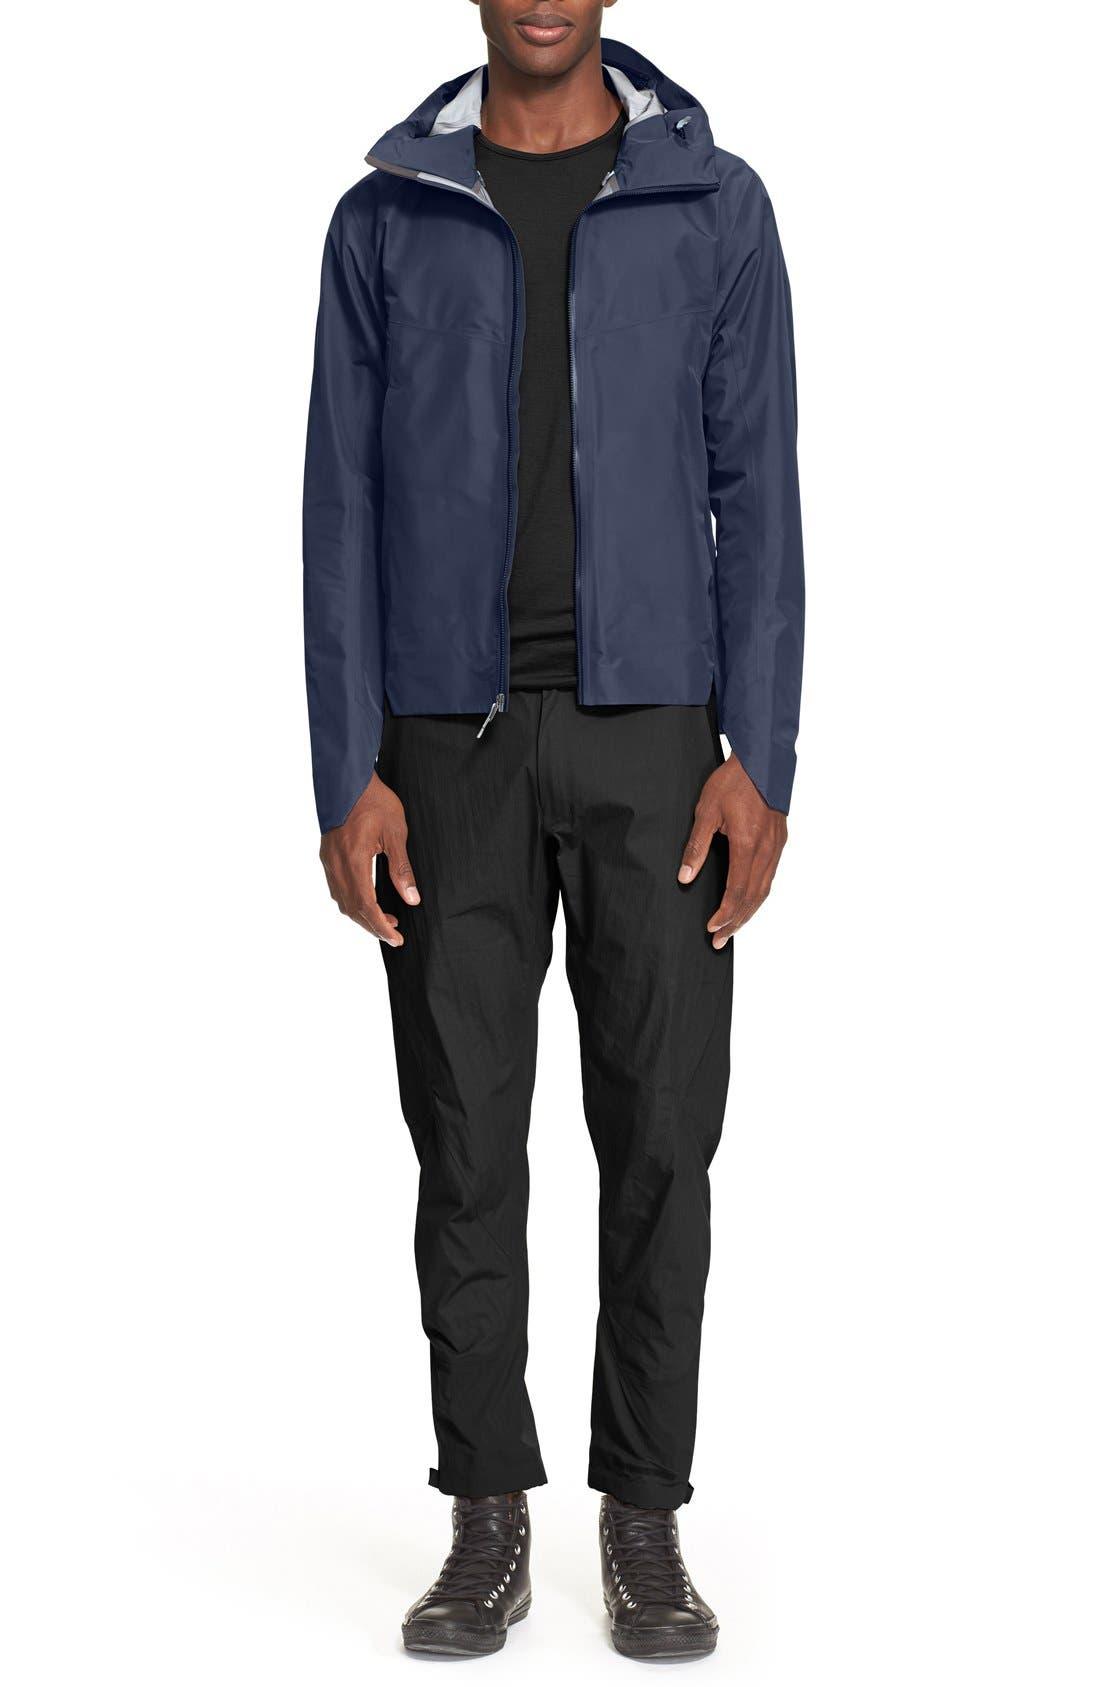 ARC'TERYX VEILANCE,                             'Frame' Merino Wool T-Shirt,                             Alternate thumbnail 6, color,                             001